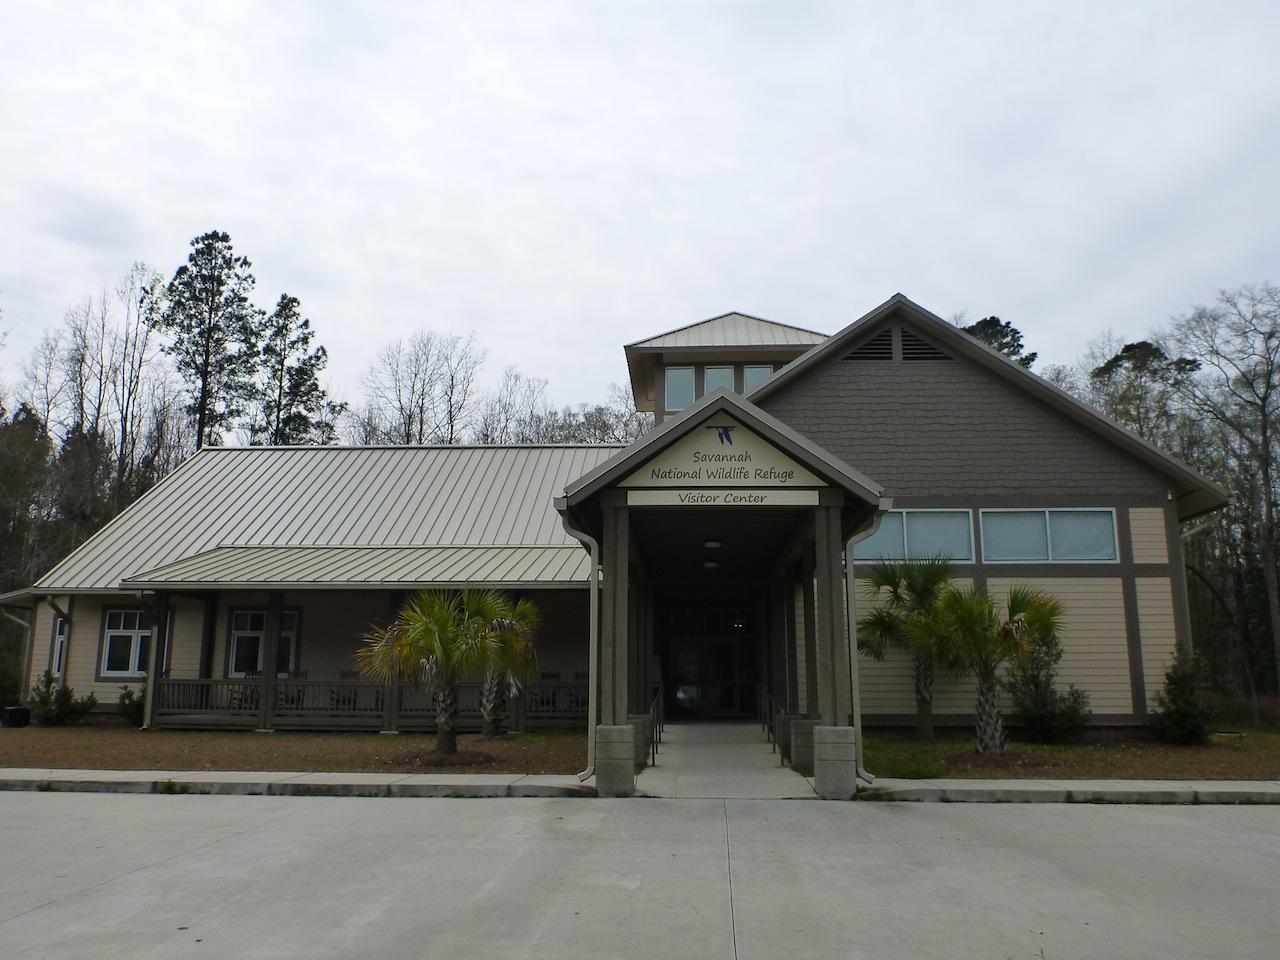 Savannah National Wildlife Refuge Visitor's Center